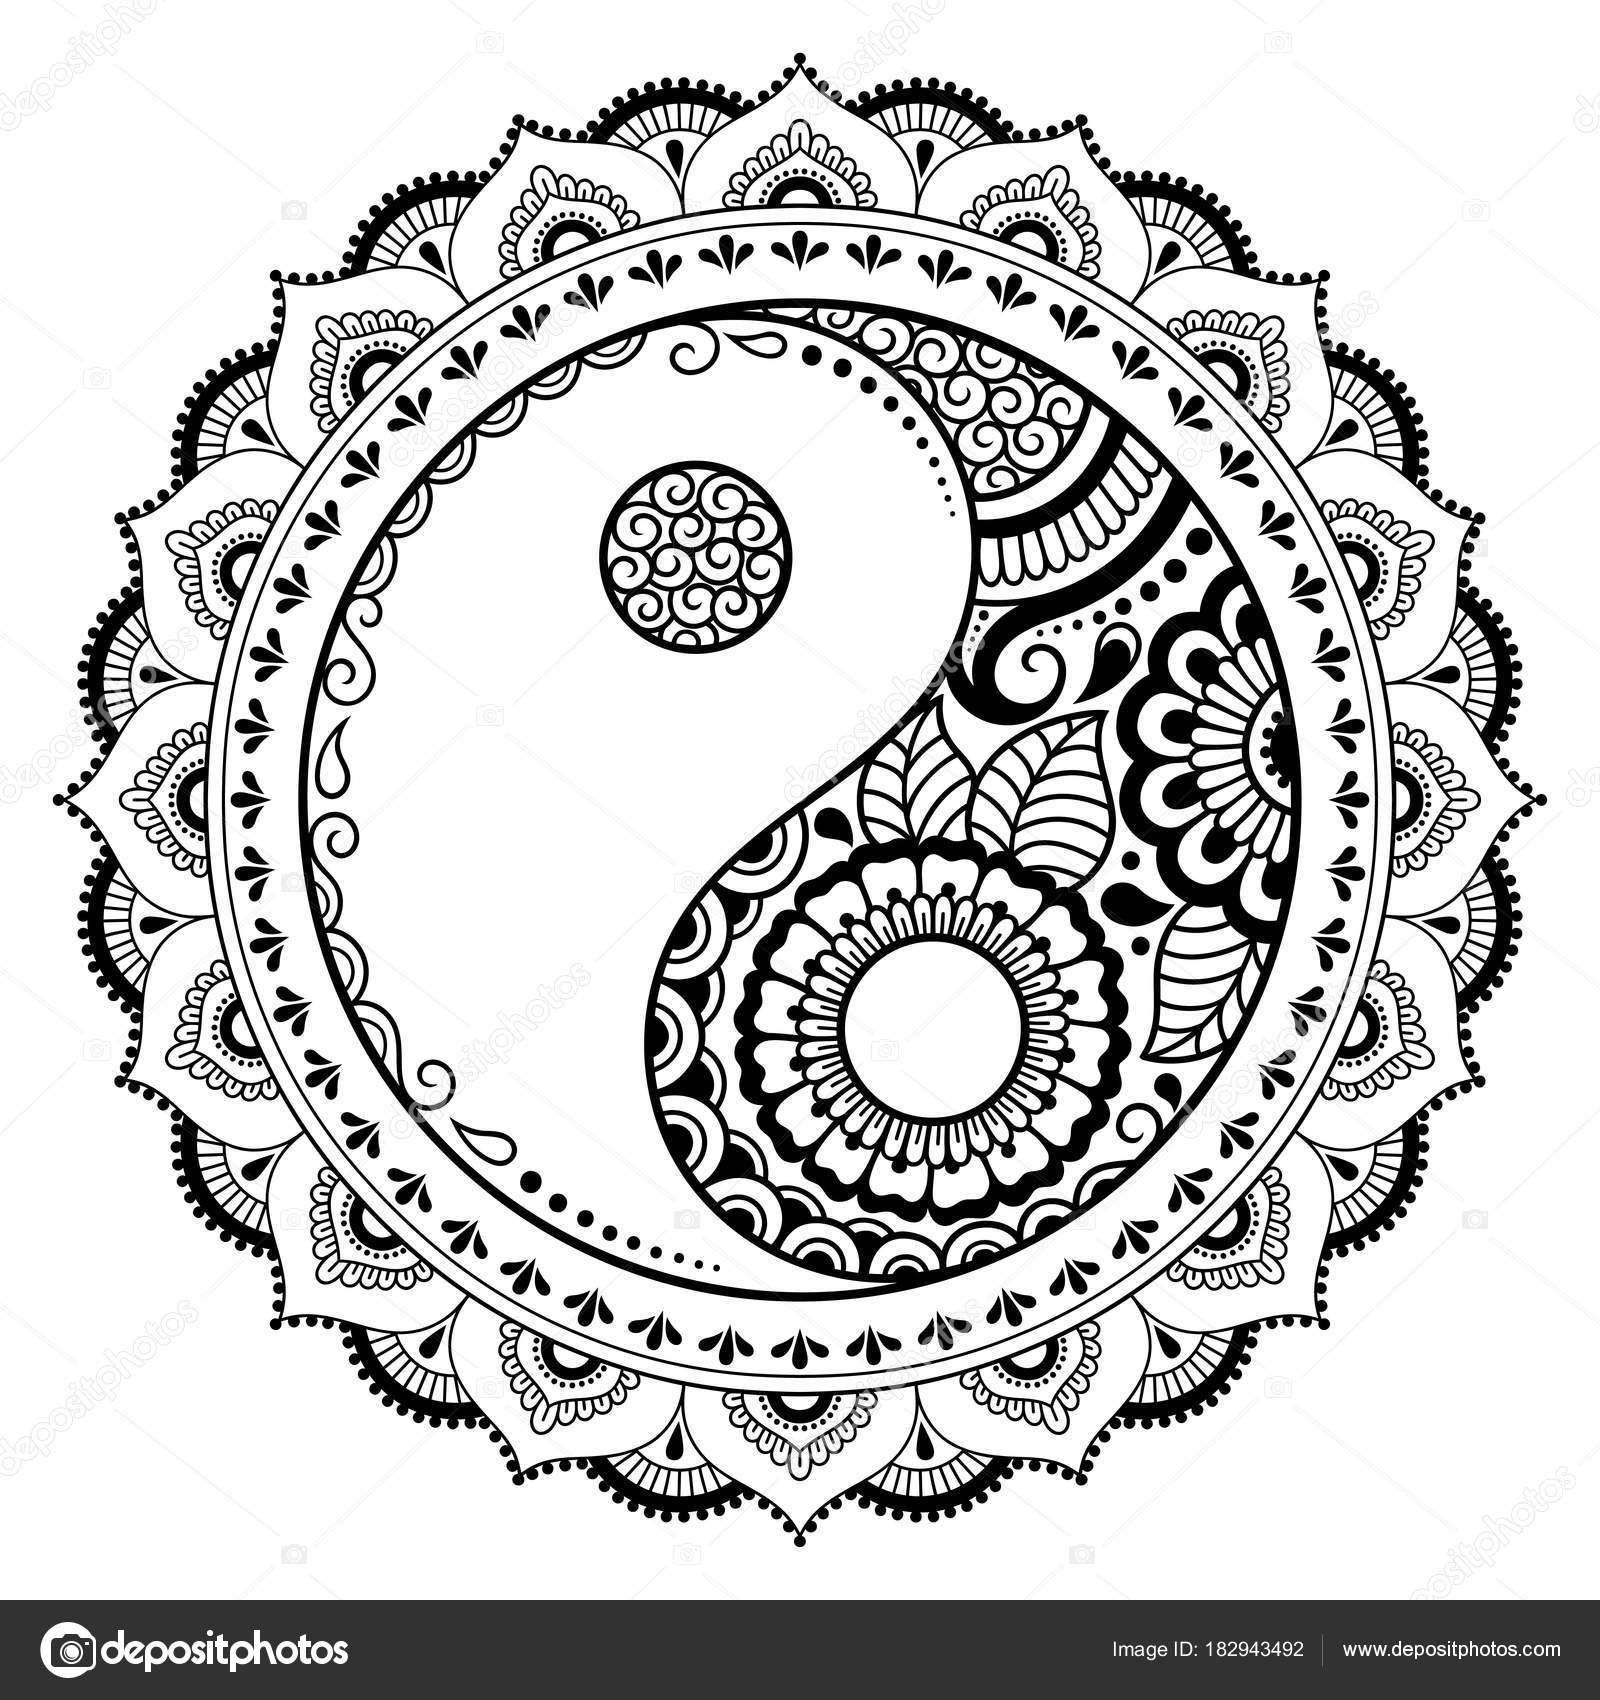 ying yang yo coloring pages - photo#47